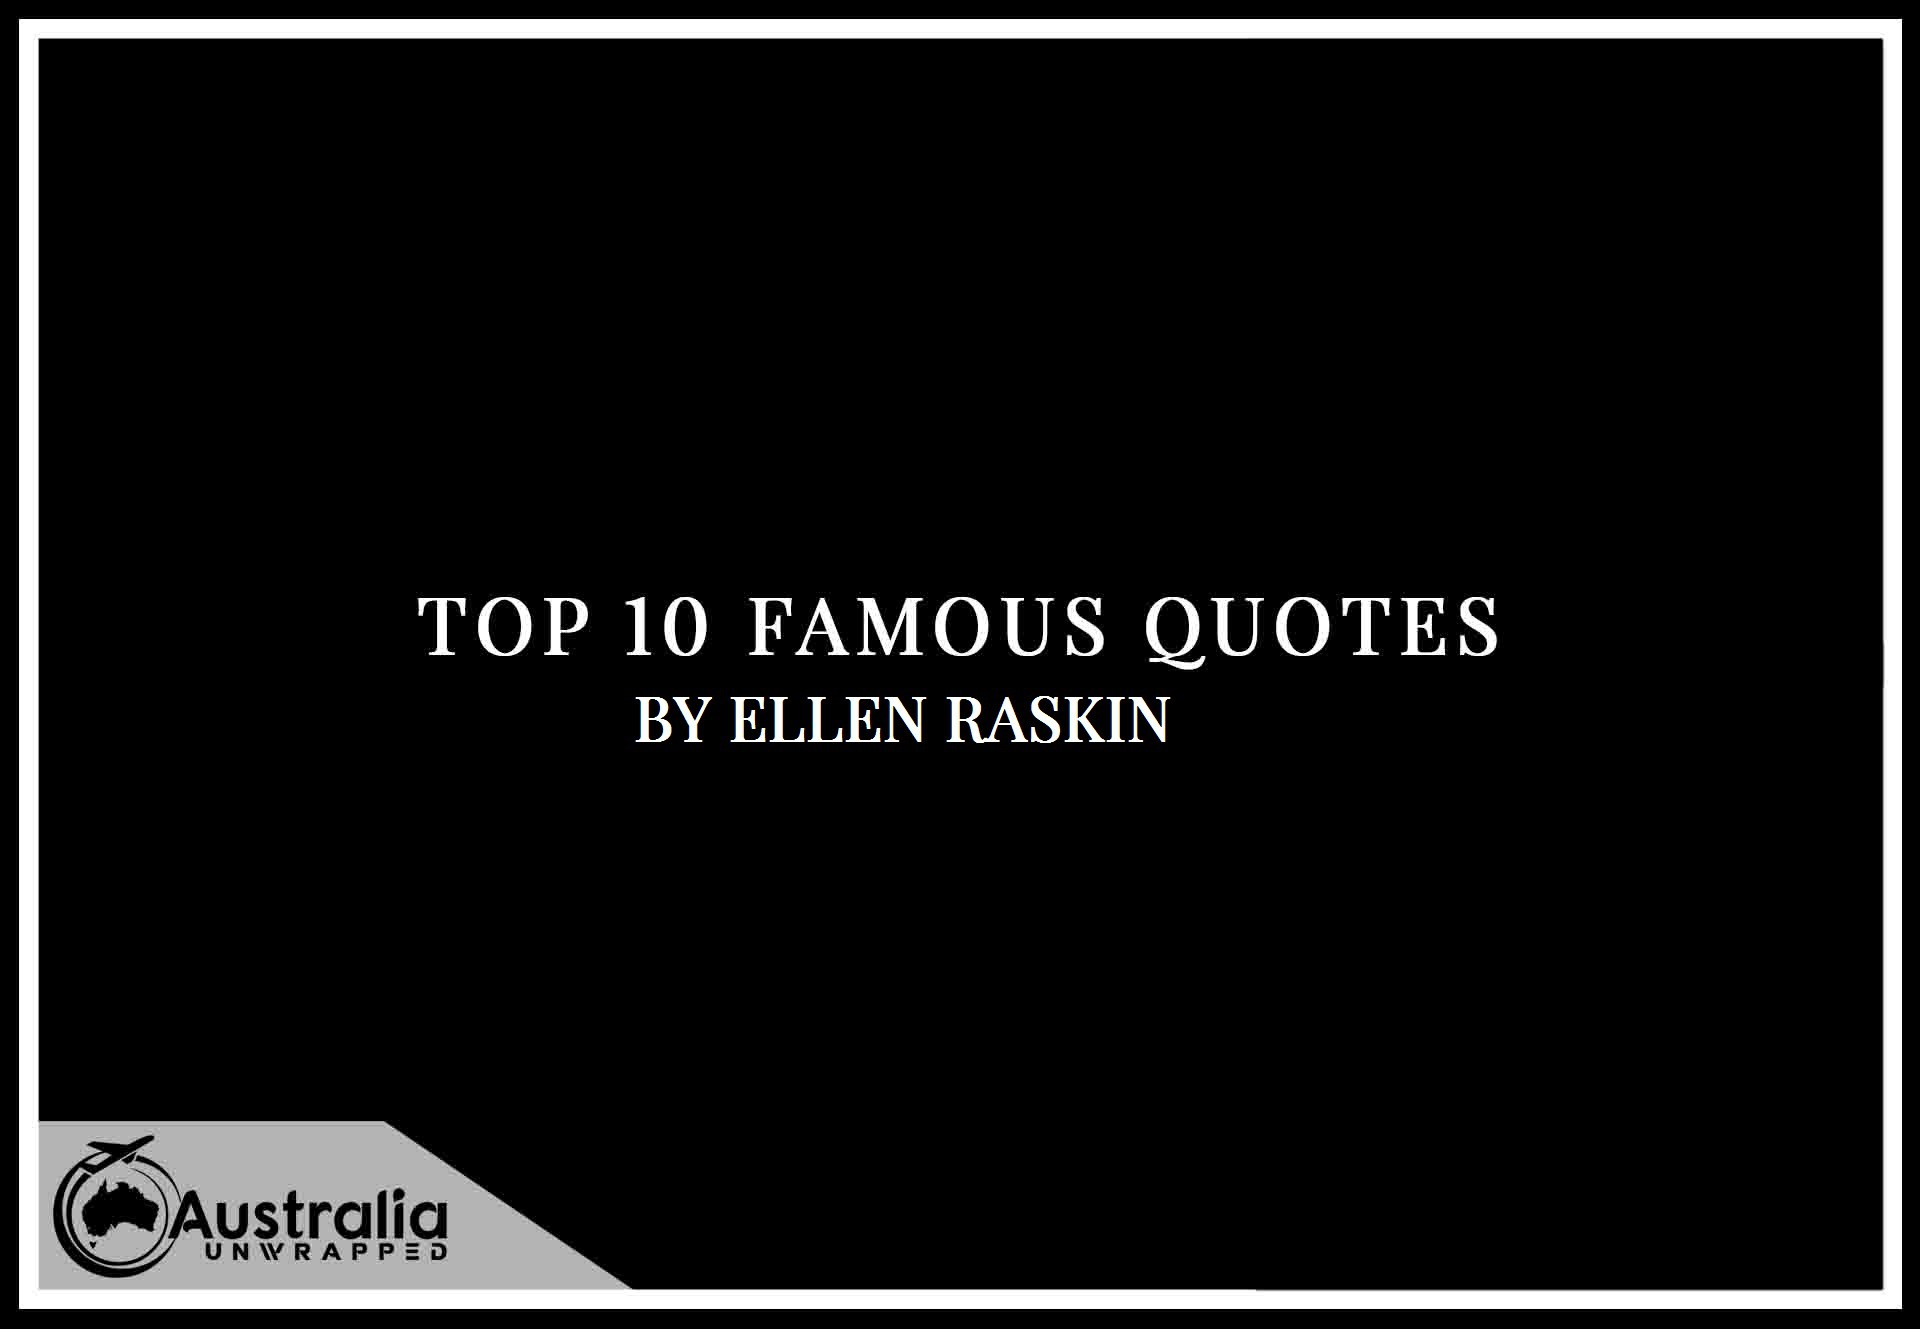 Ellen Raskin's Top 10 Popular and Famous Quotes